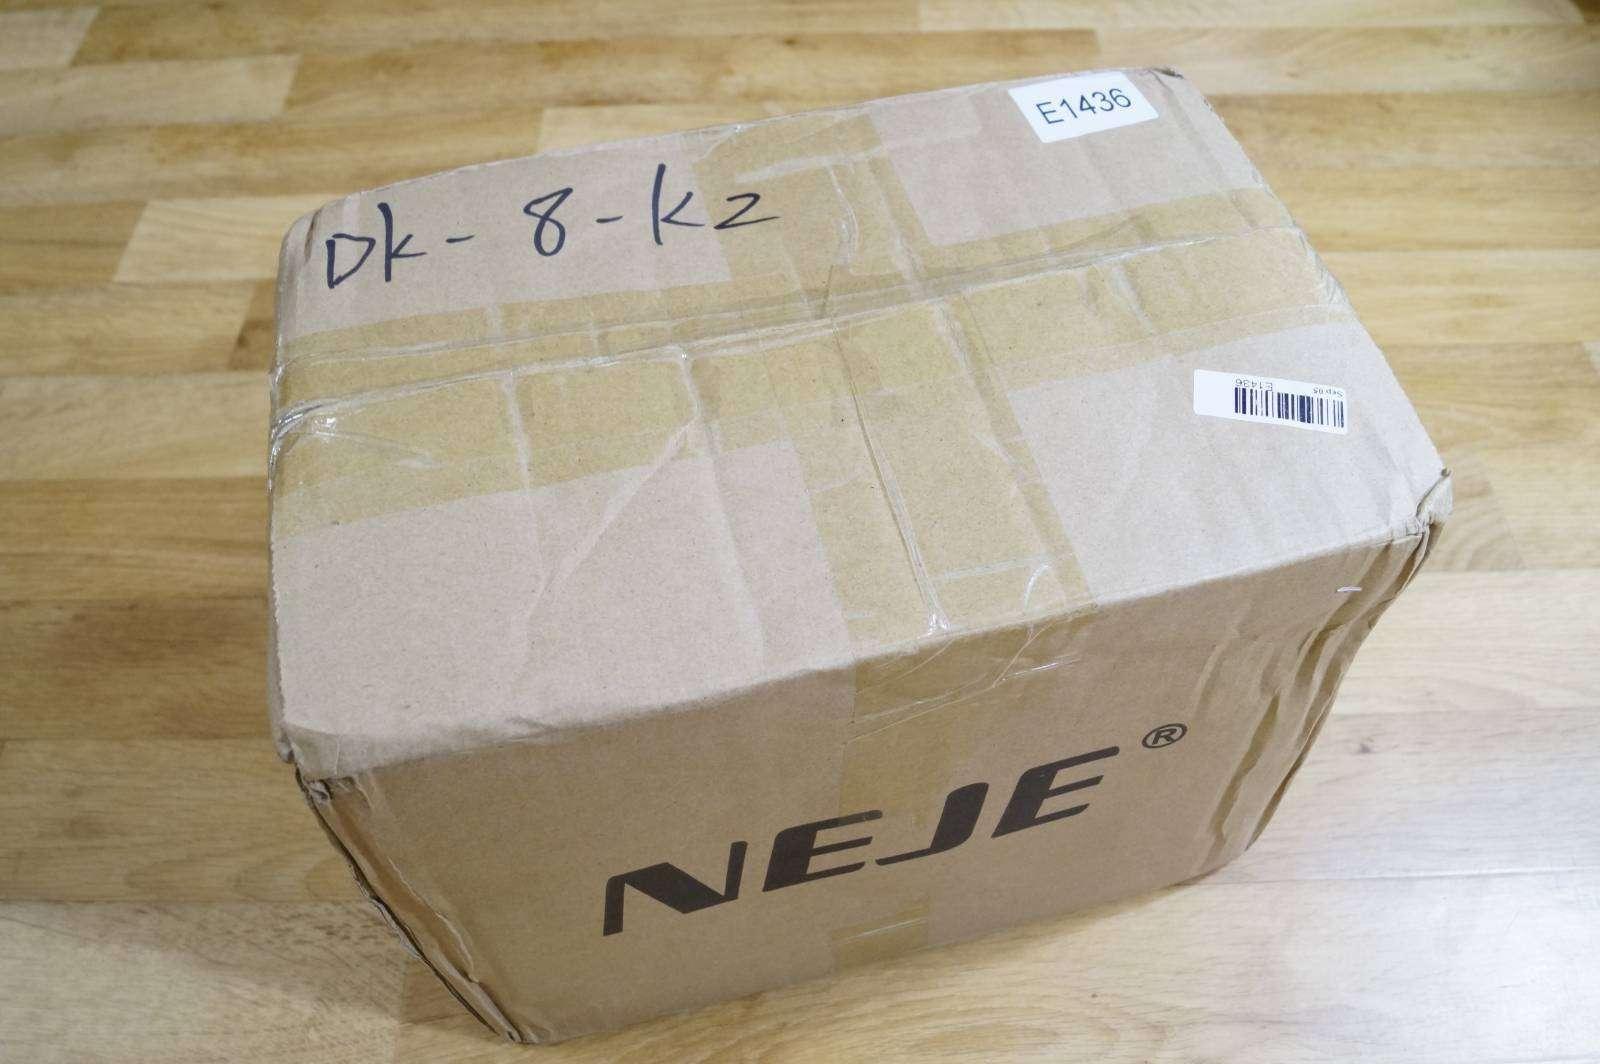 Ebay: Лазерный гравер Neje DK-8-KZ на 1000мВт